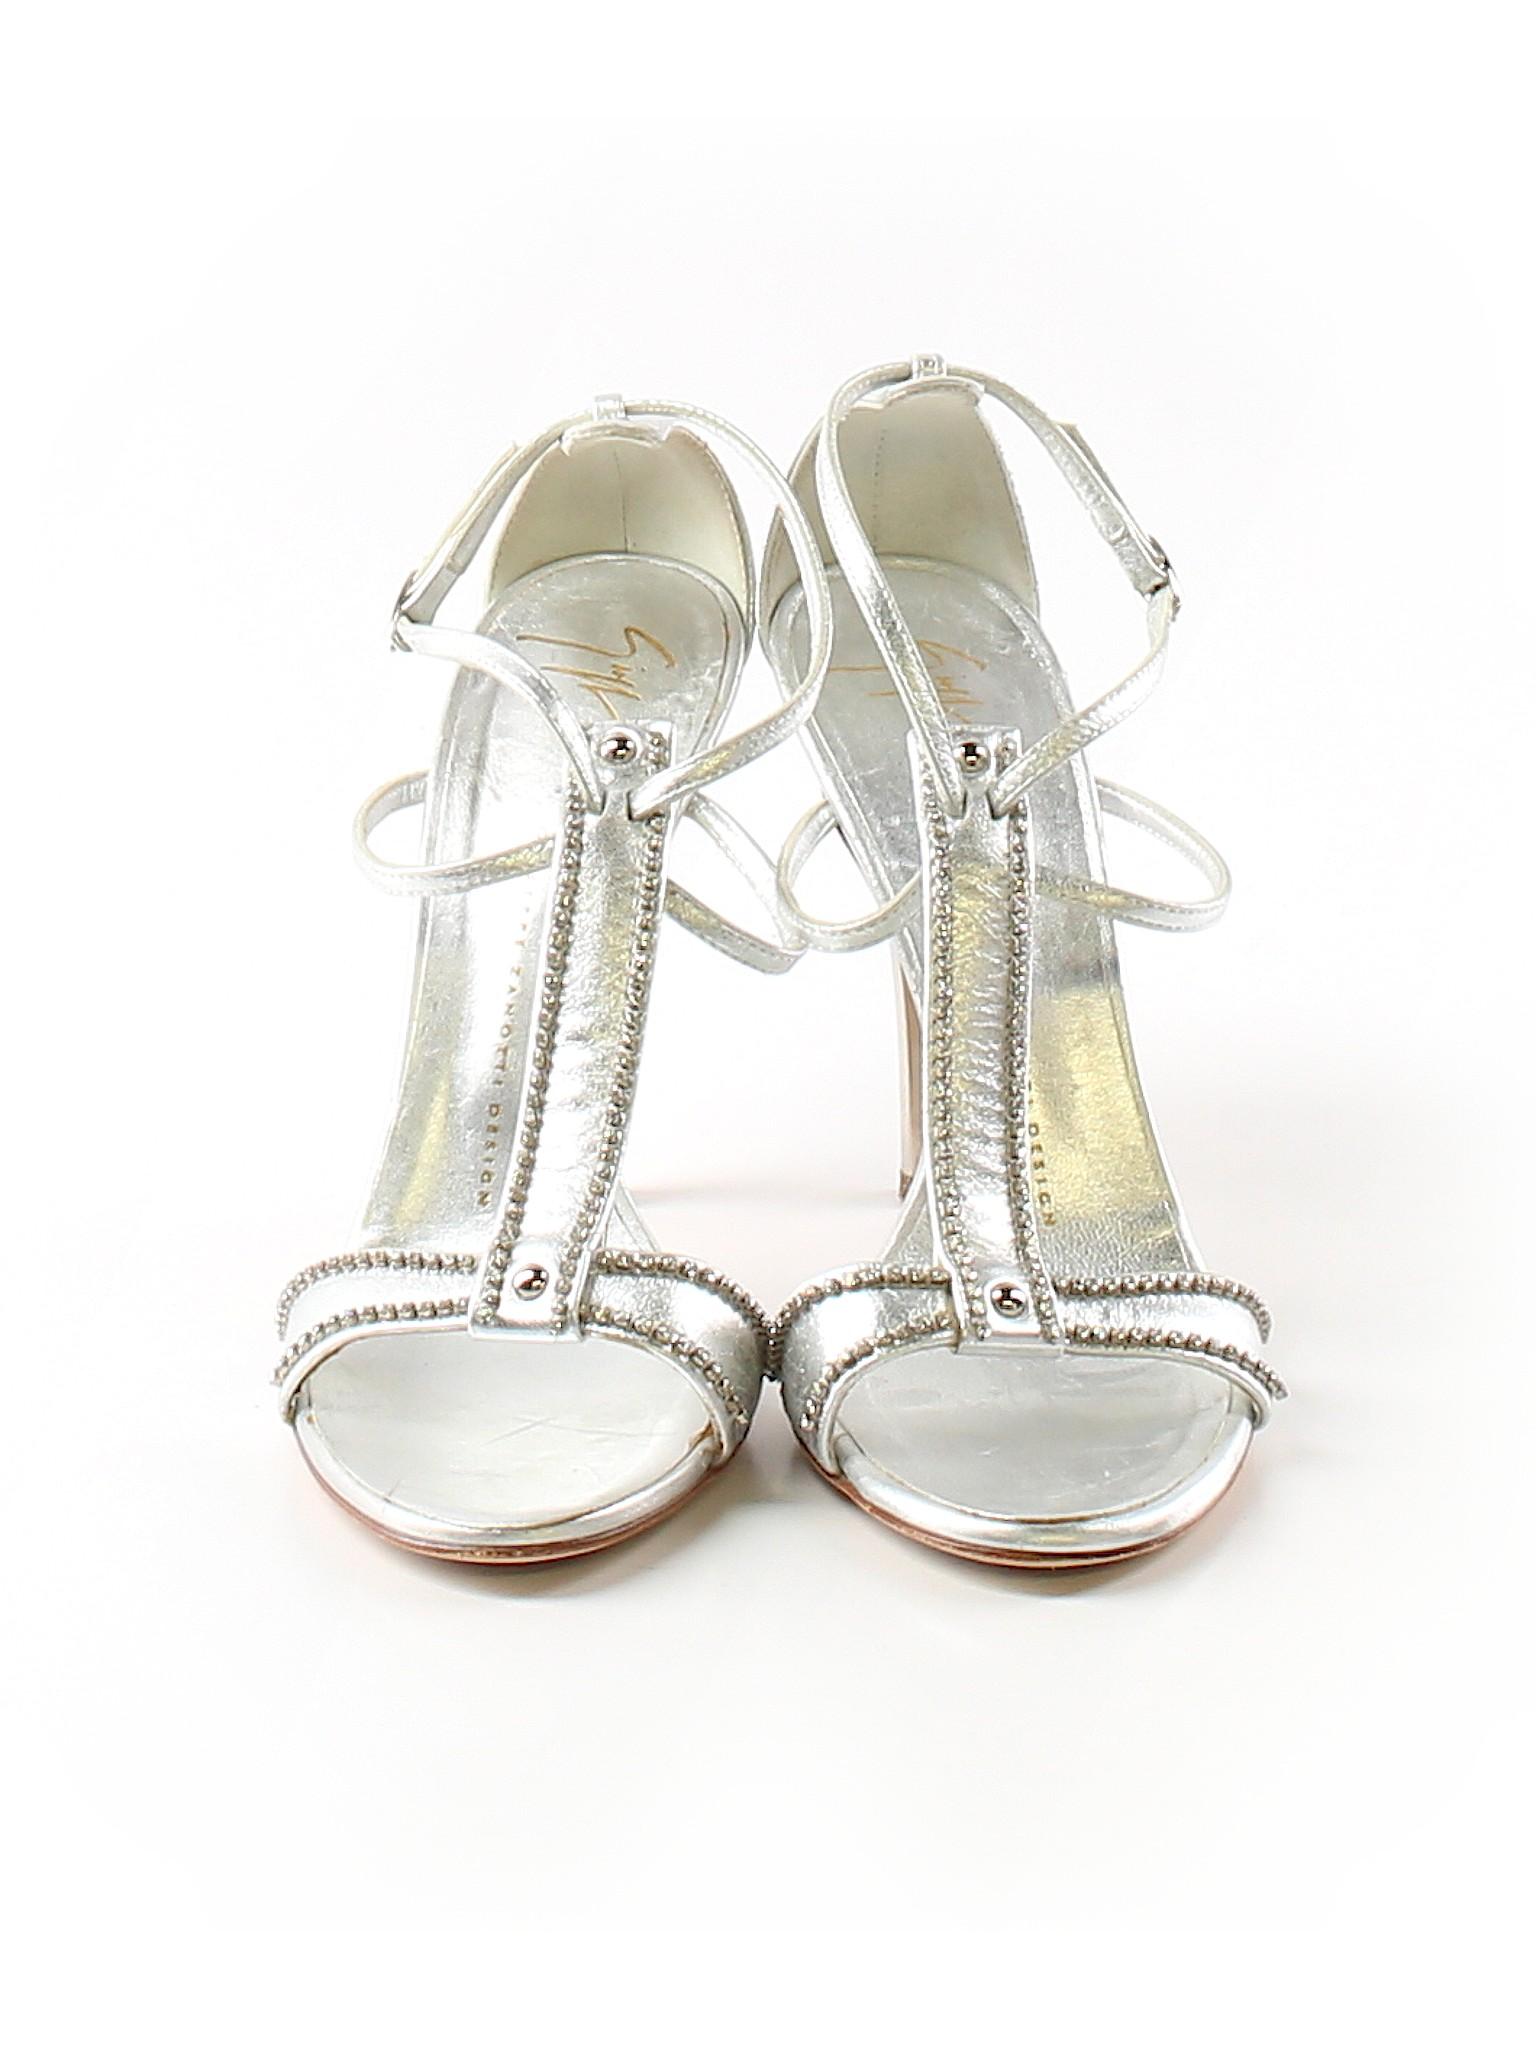 ab10cc787f8 Giuseppe Zanotti 100% Leather Solid Silver Heels Size 38.5 (EU) - 80% off